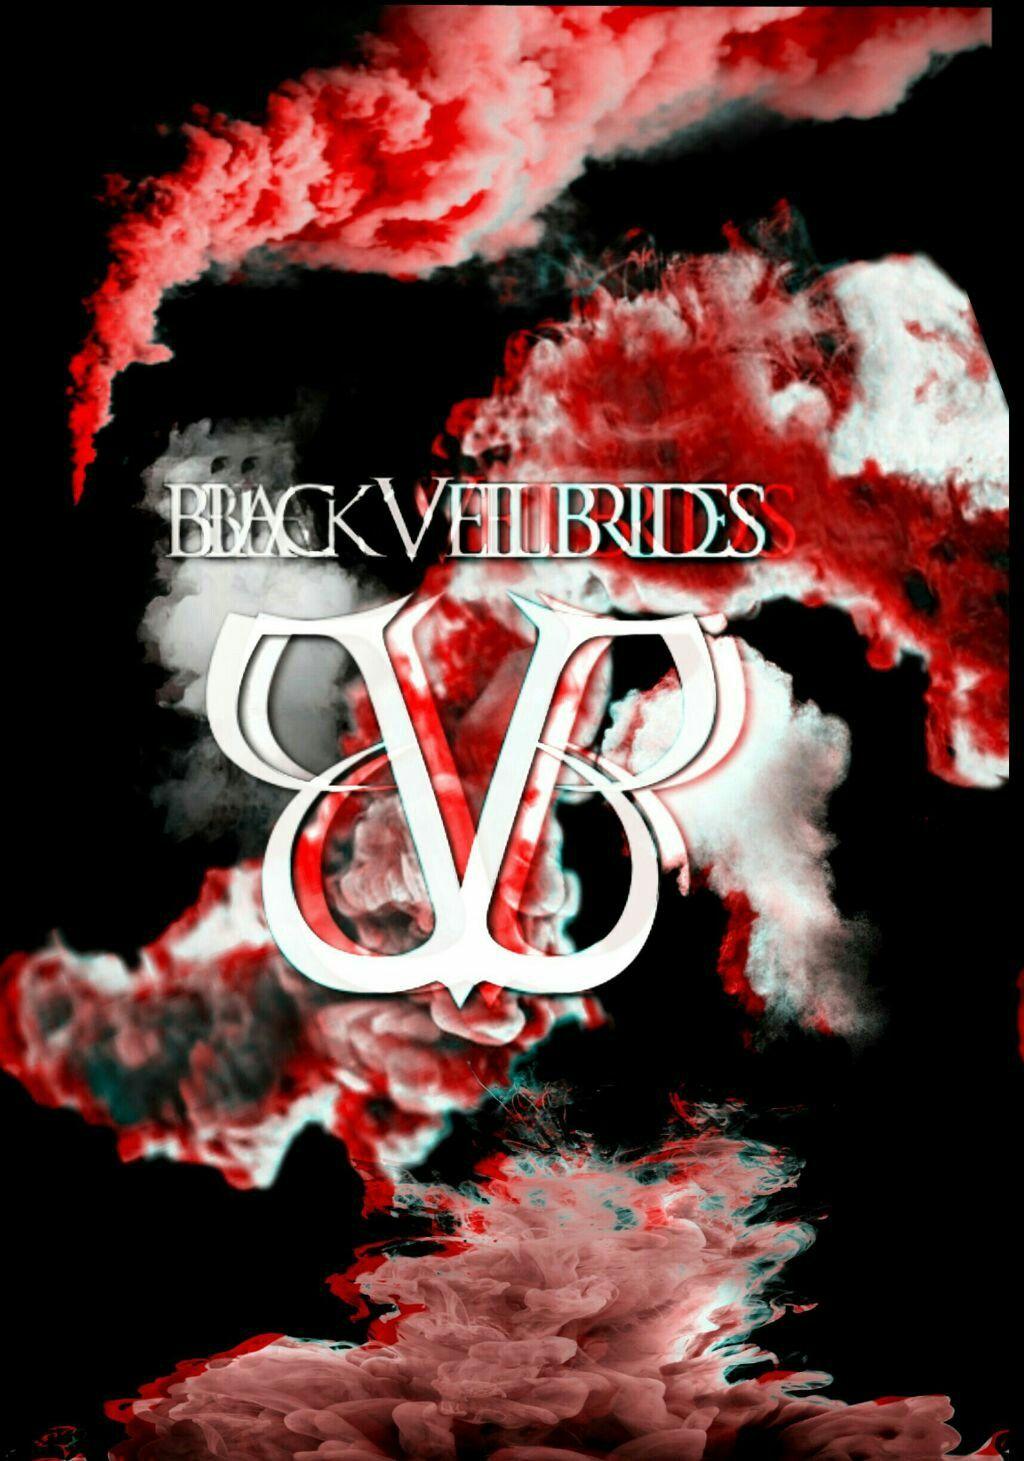 Pin By Samaraa 888 On Black Veil Brides Black Veil Brides Black Veil Black Veil Brides Andy